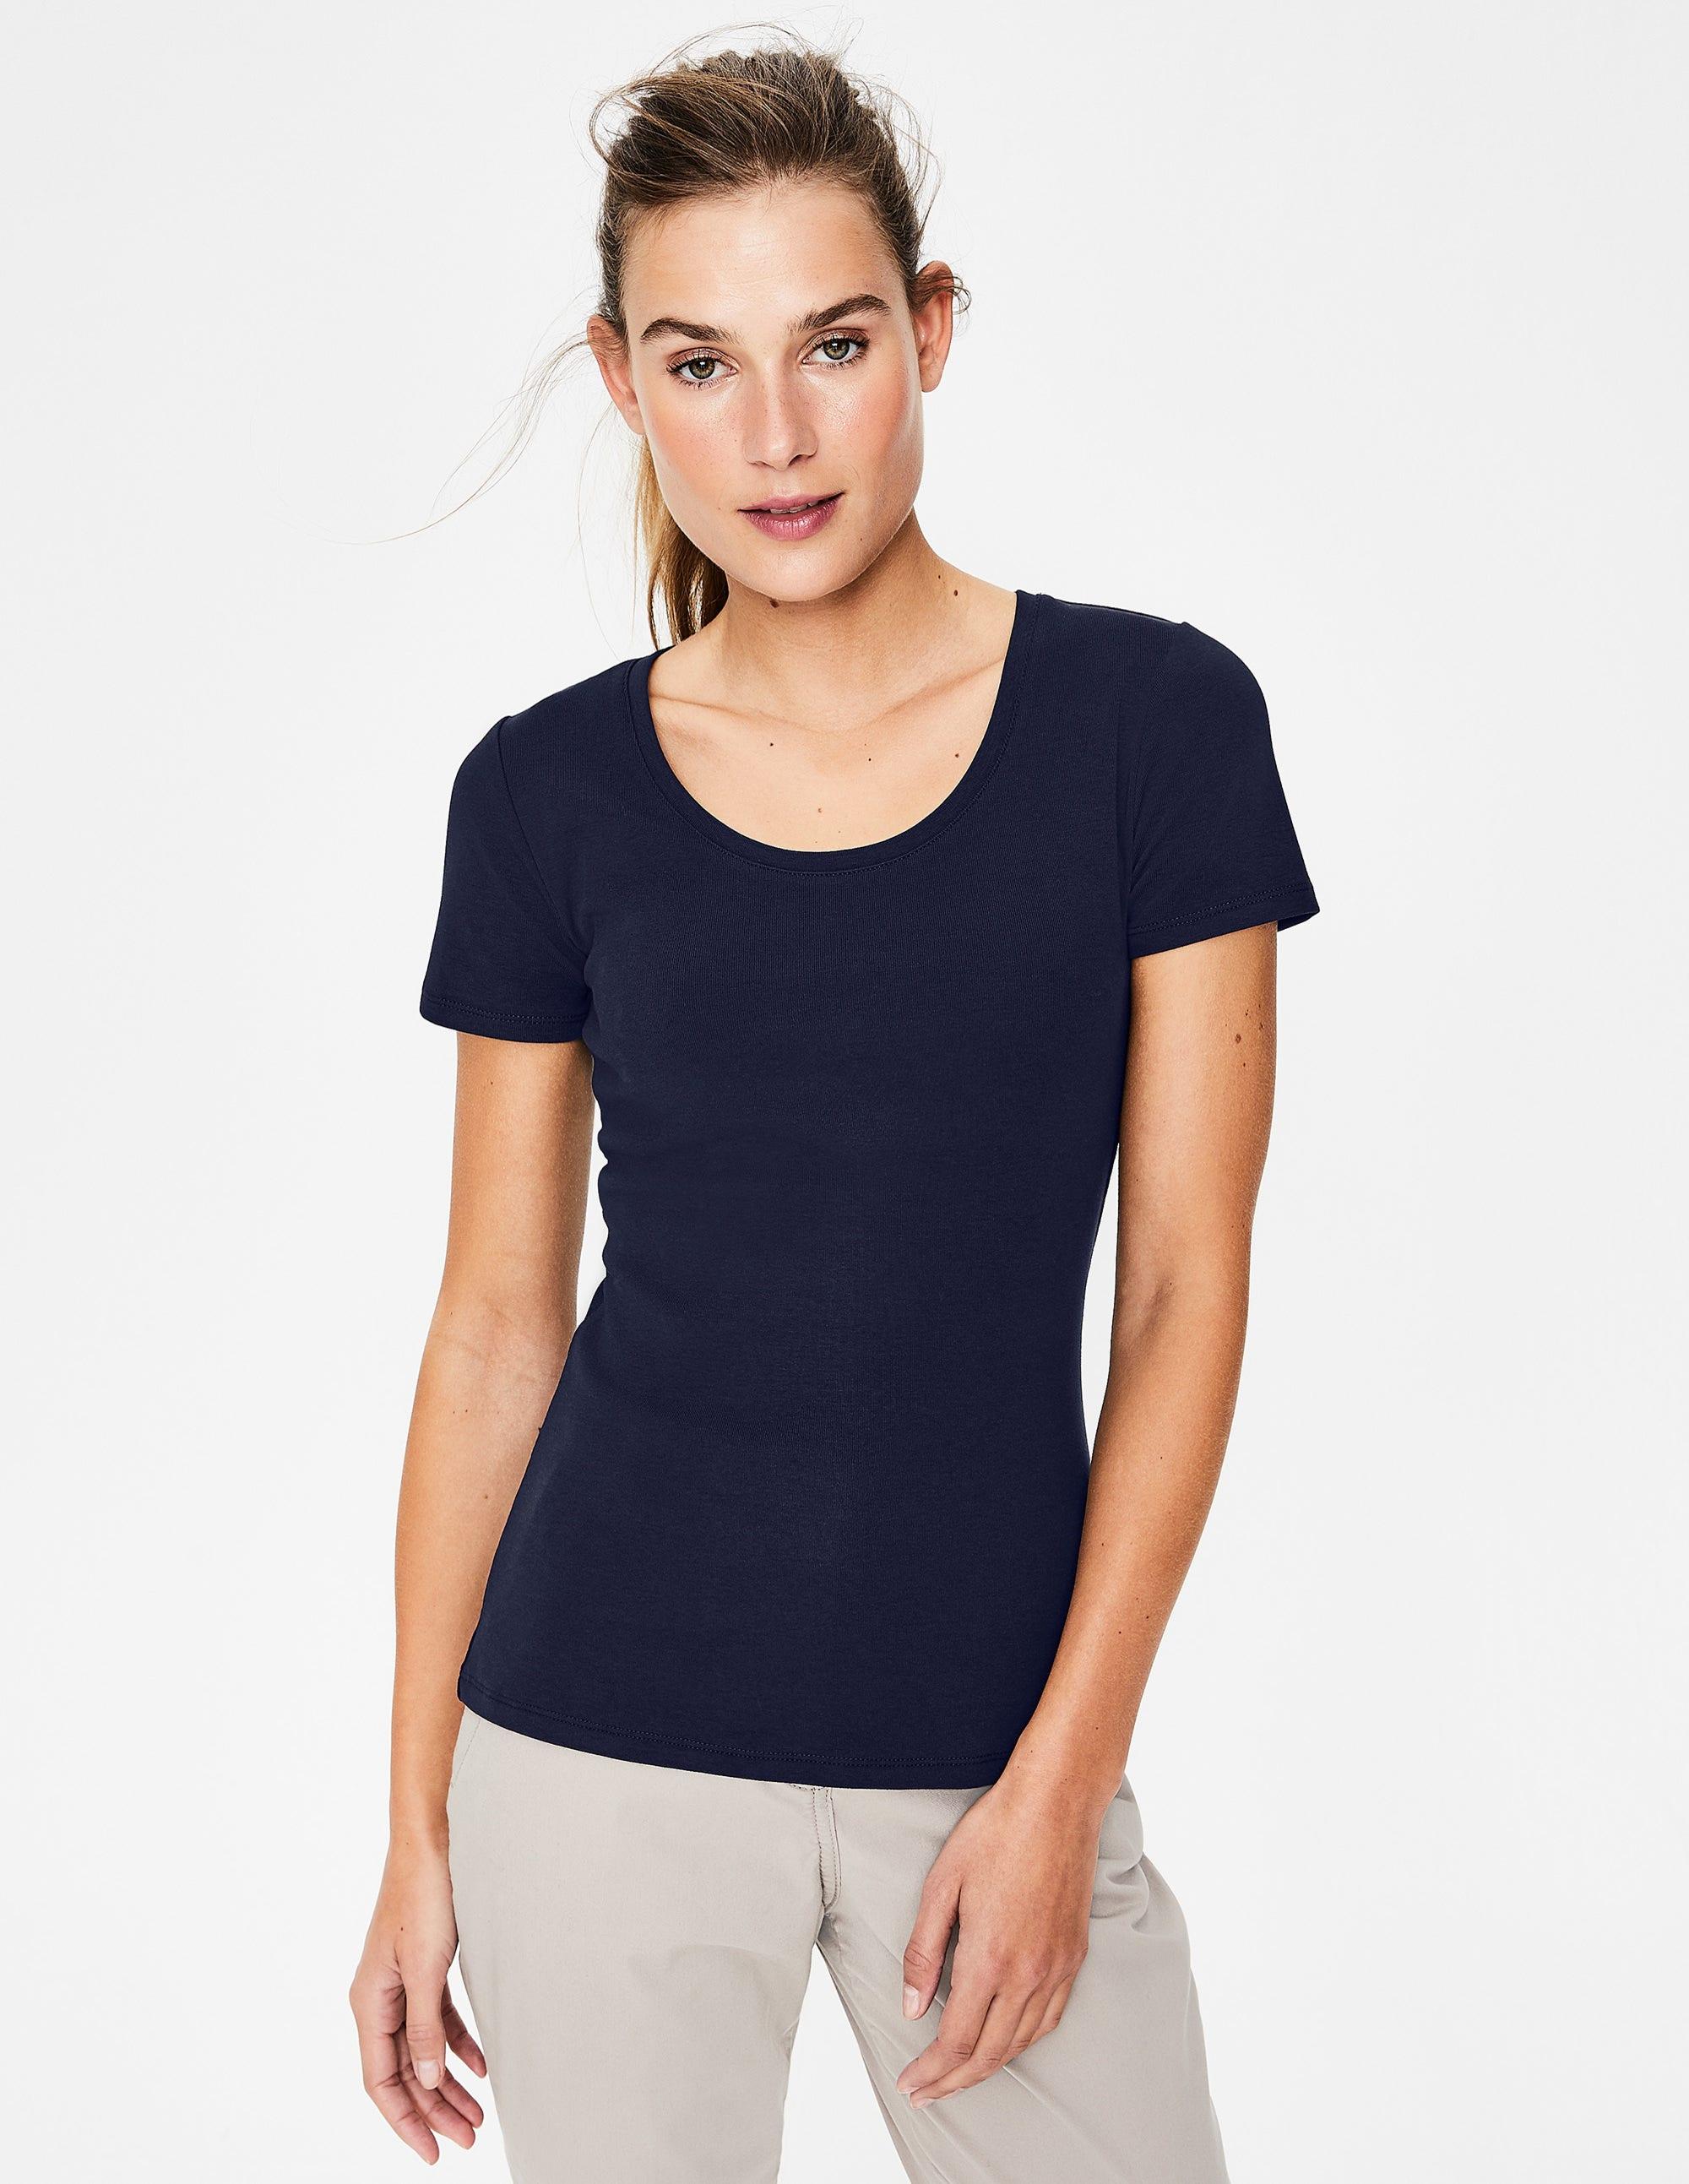 d66a272060c1 Essential Short Sleeve Tee - Black | Boden US